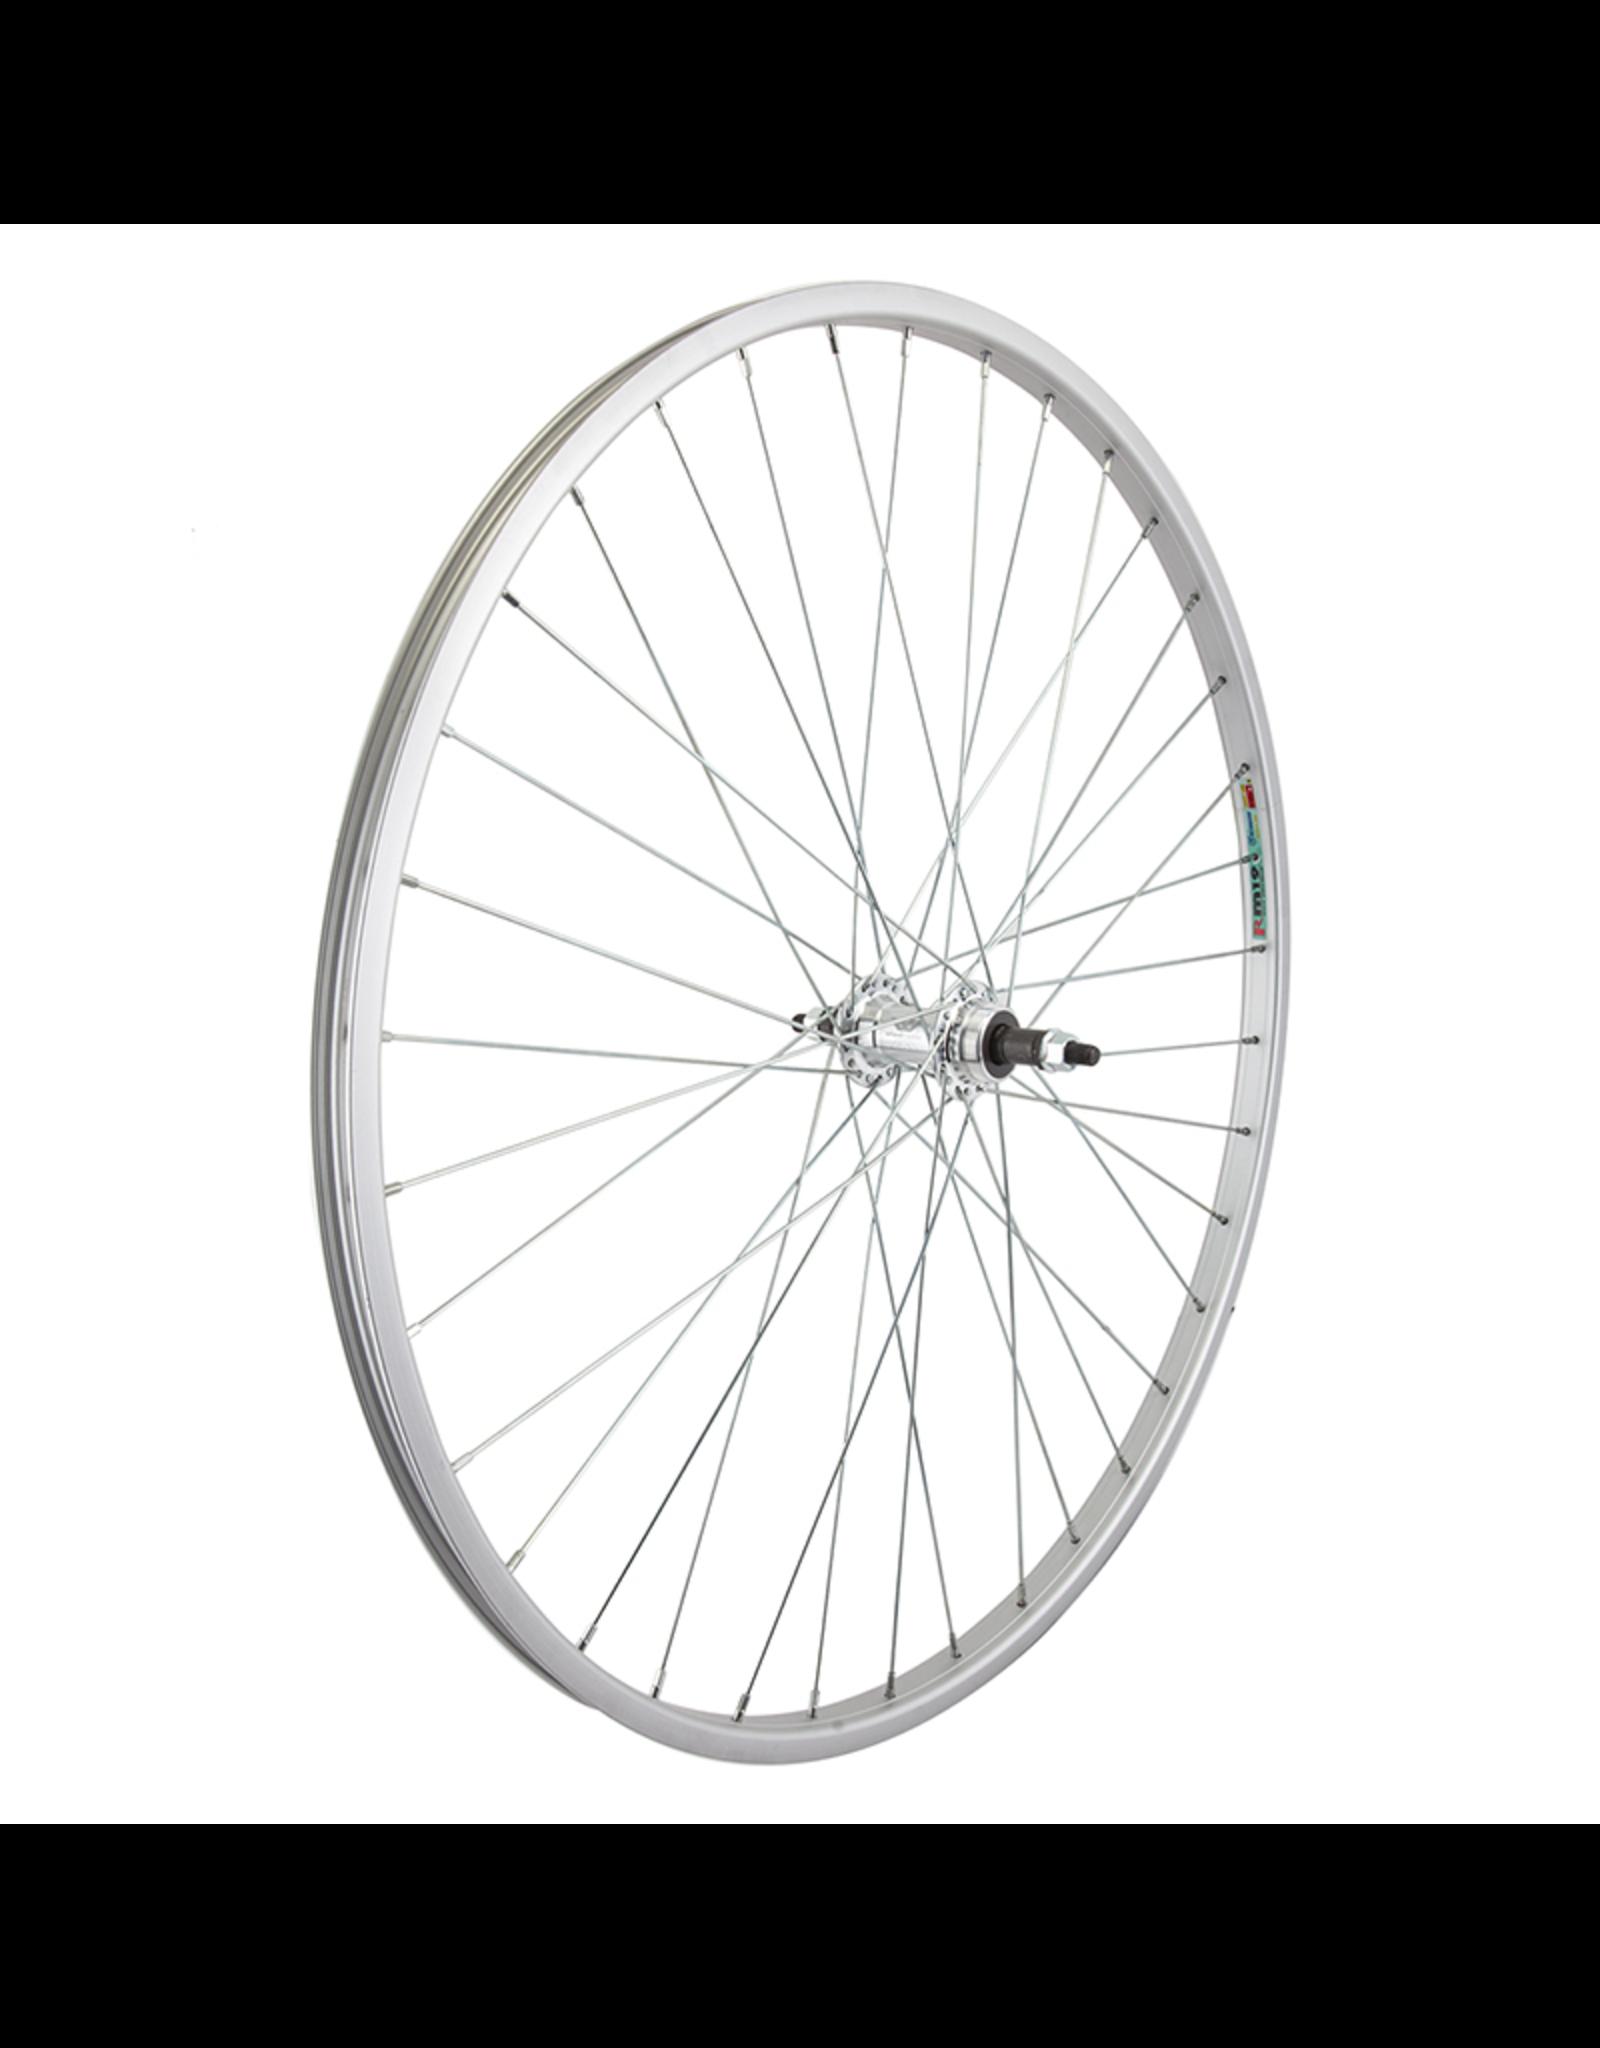 "Wheelmaster 27"" Alloy Road Rear Wheel"